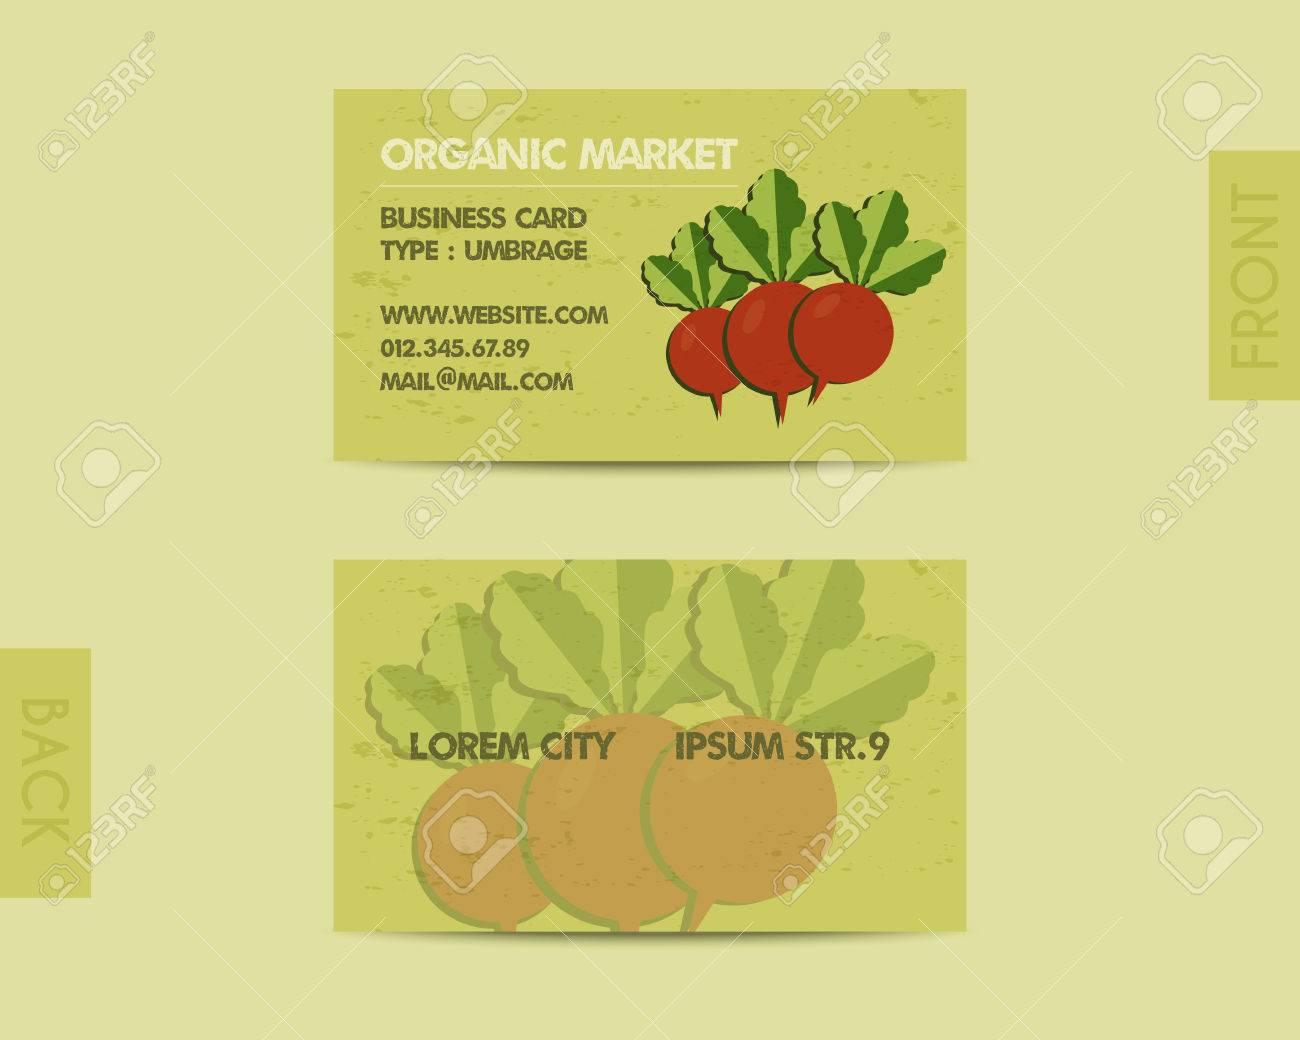 Summer farm fresh branding identity elements business card template summer farm fresh branding identity elements business card template organic stylish design mock colourmoves